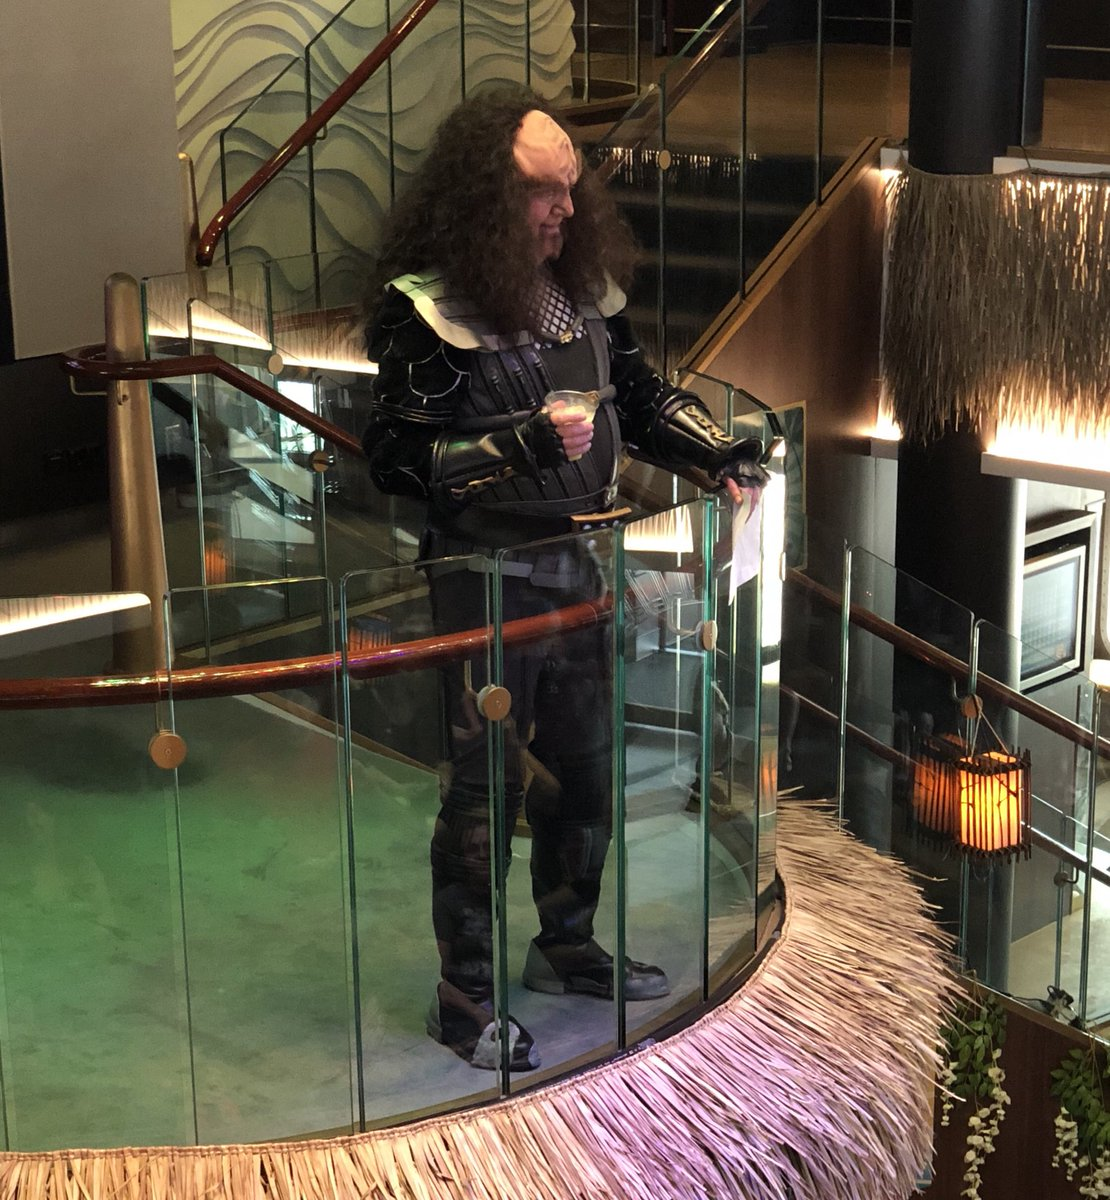 RT @StarTrek: Chancellor Gowron leads the Klingon Pub Krawl aboard the final day of #StarTrekCruise #Qapla' https://t.co/uBOTxbNtI0